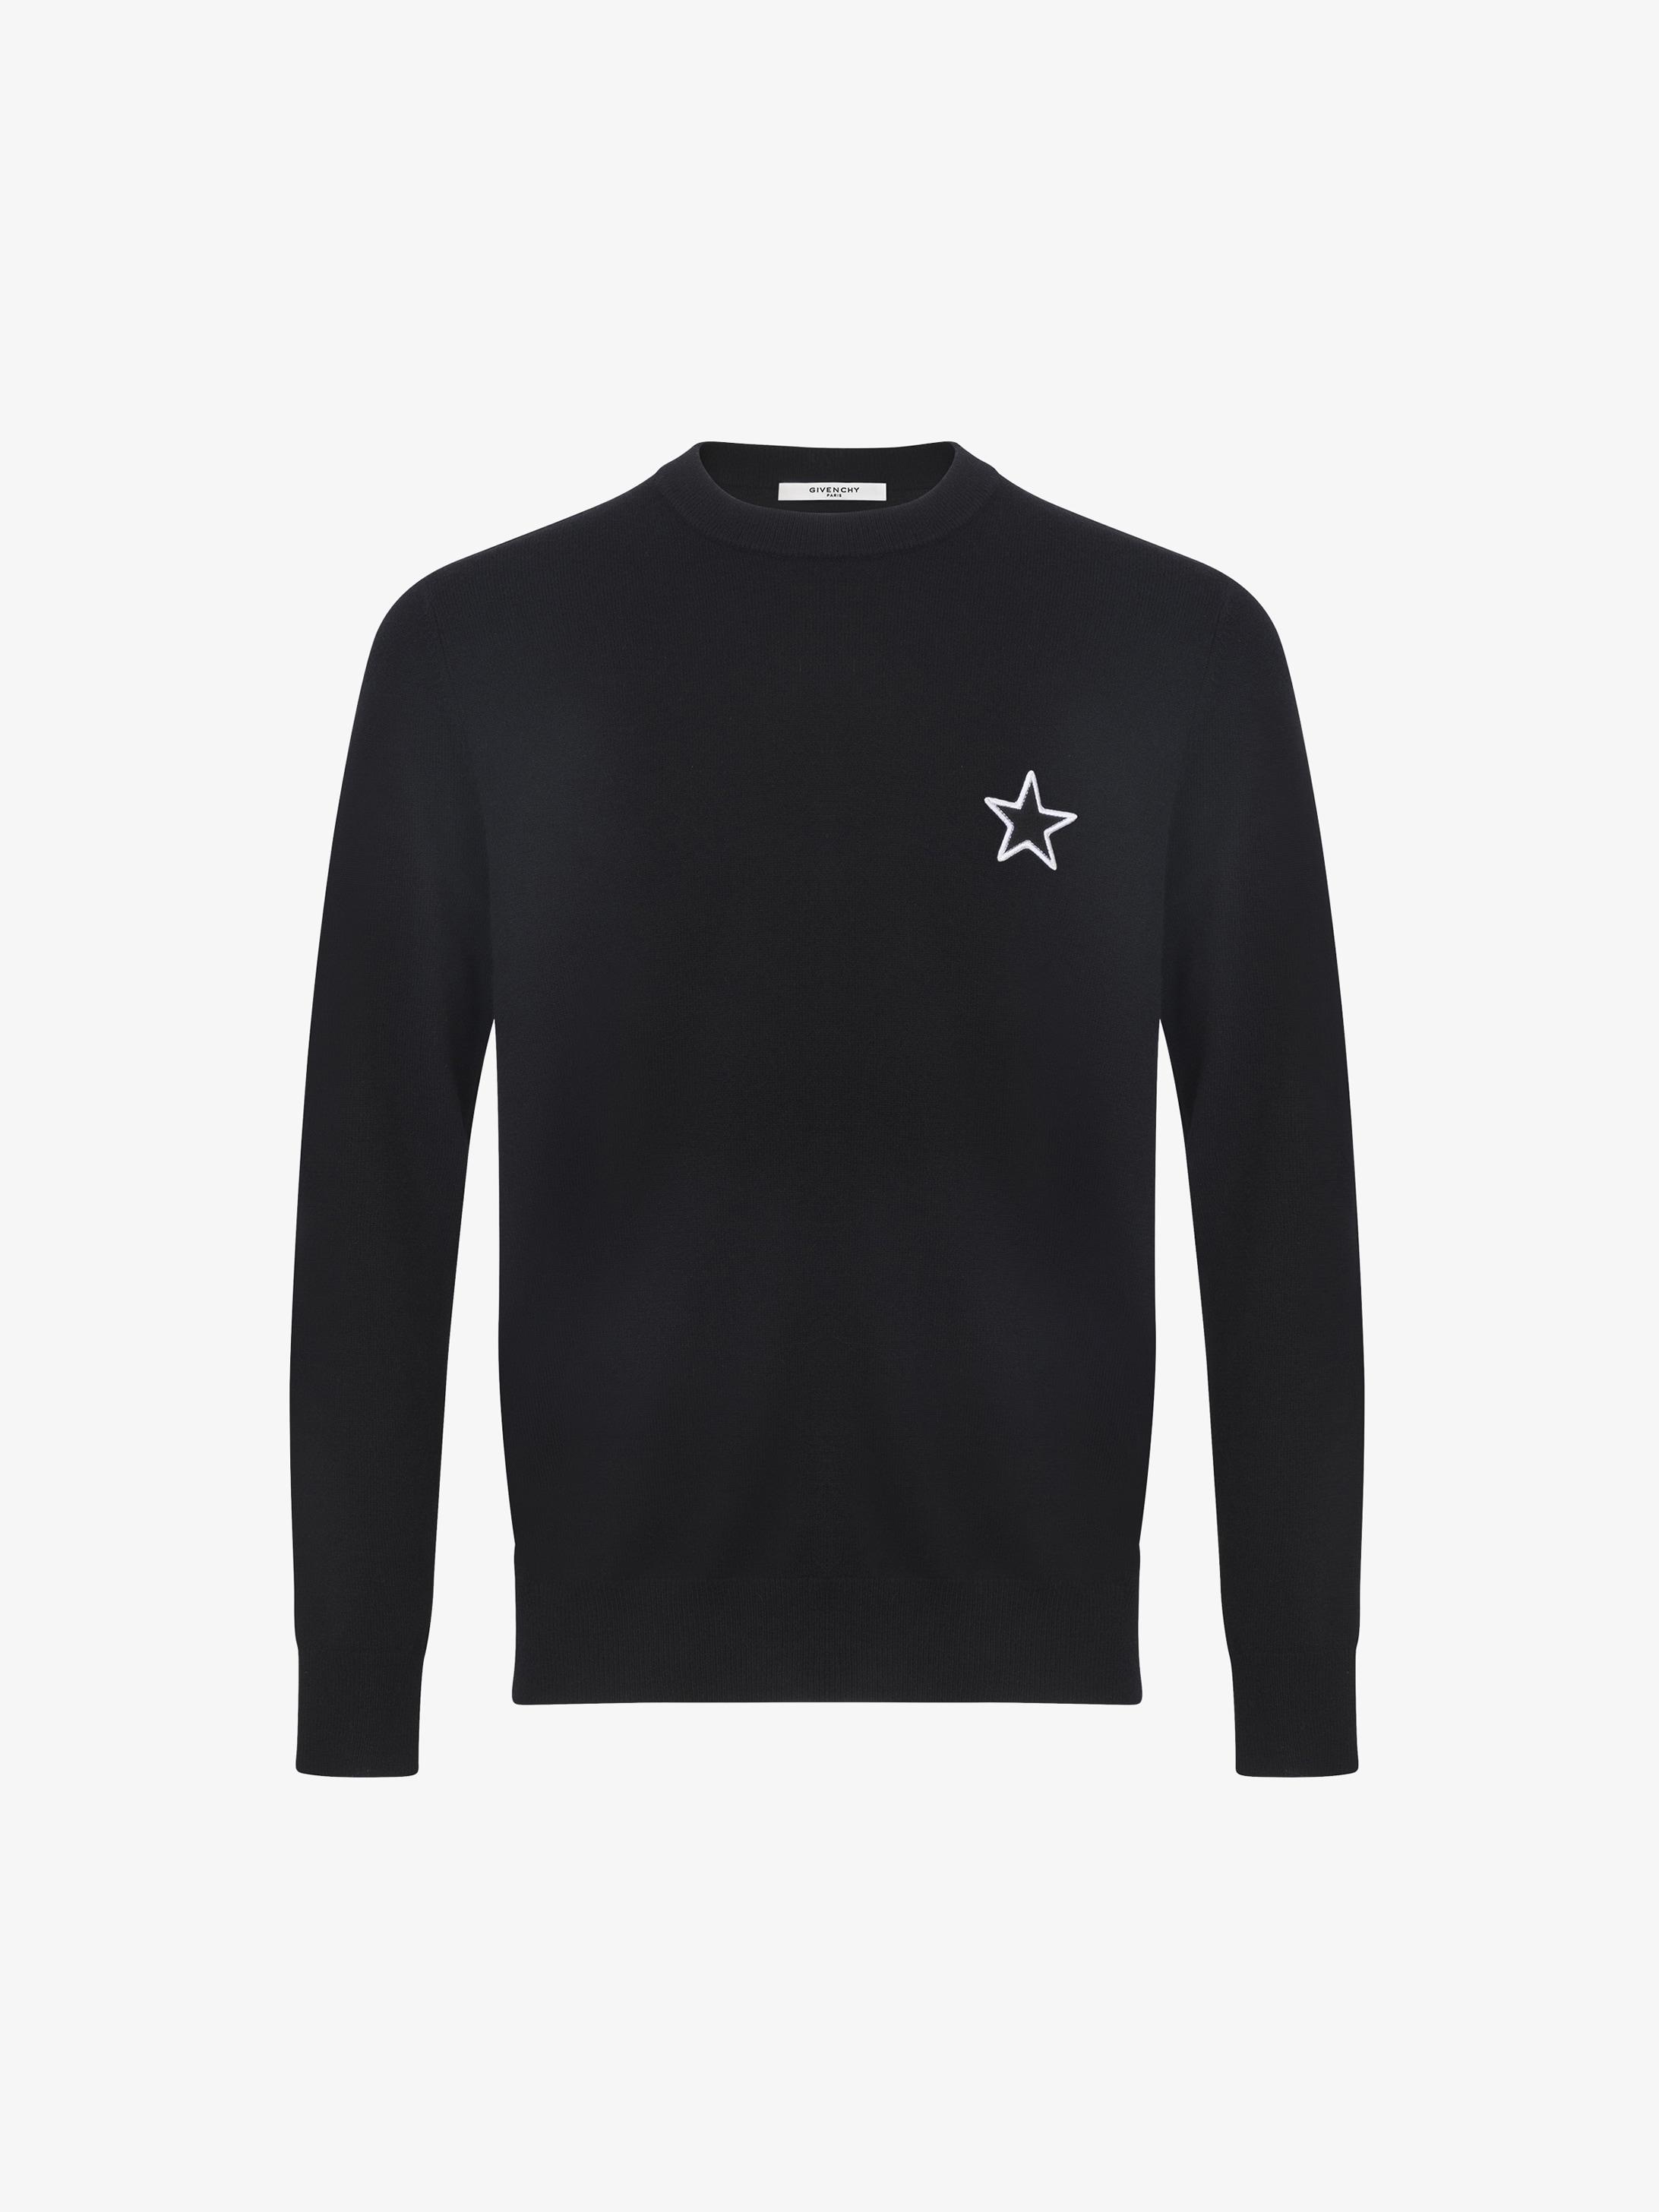 Star patch jumper in cashmere